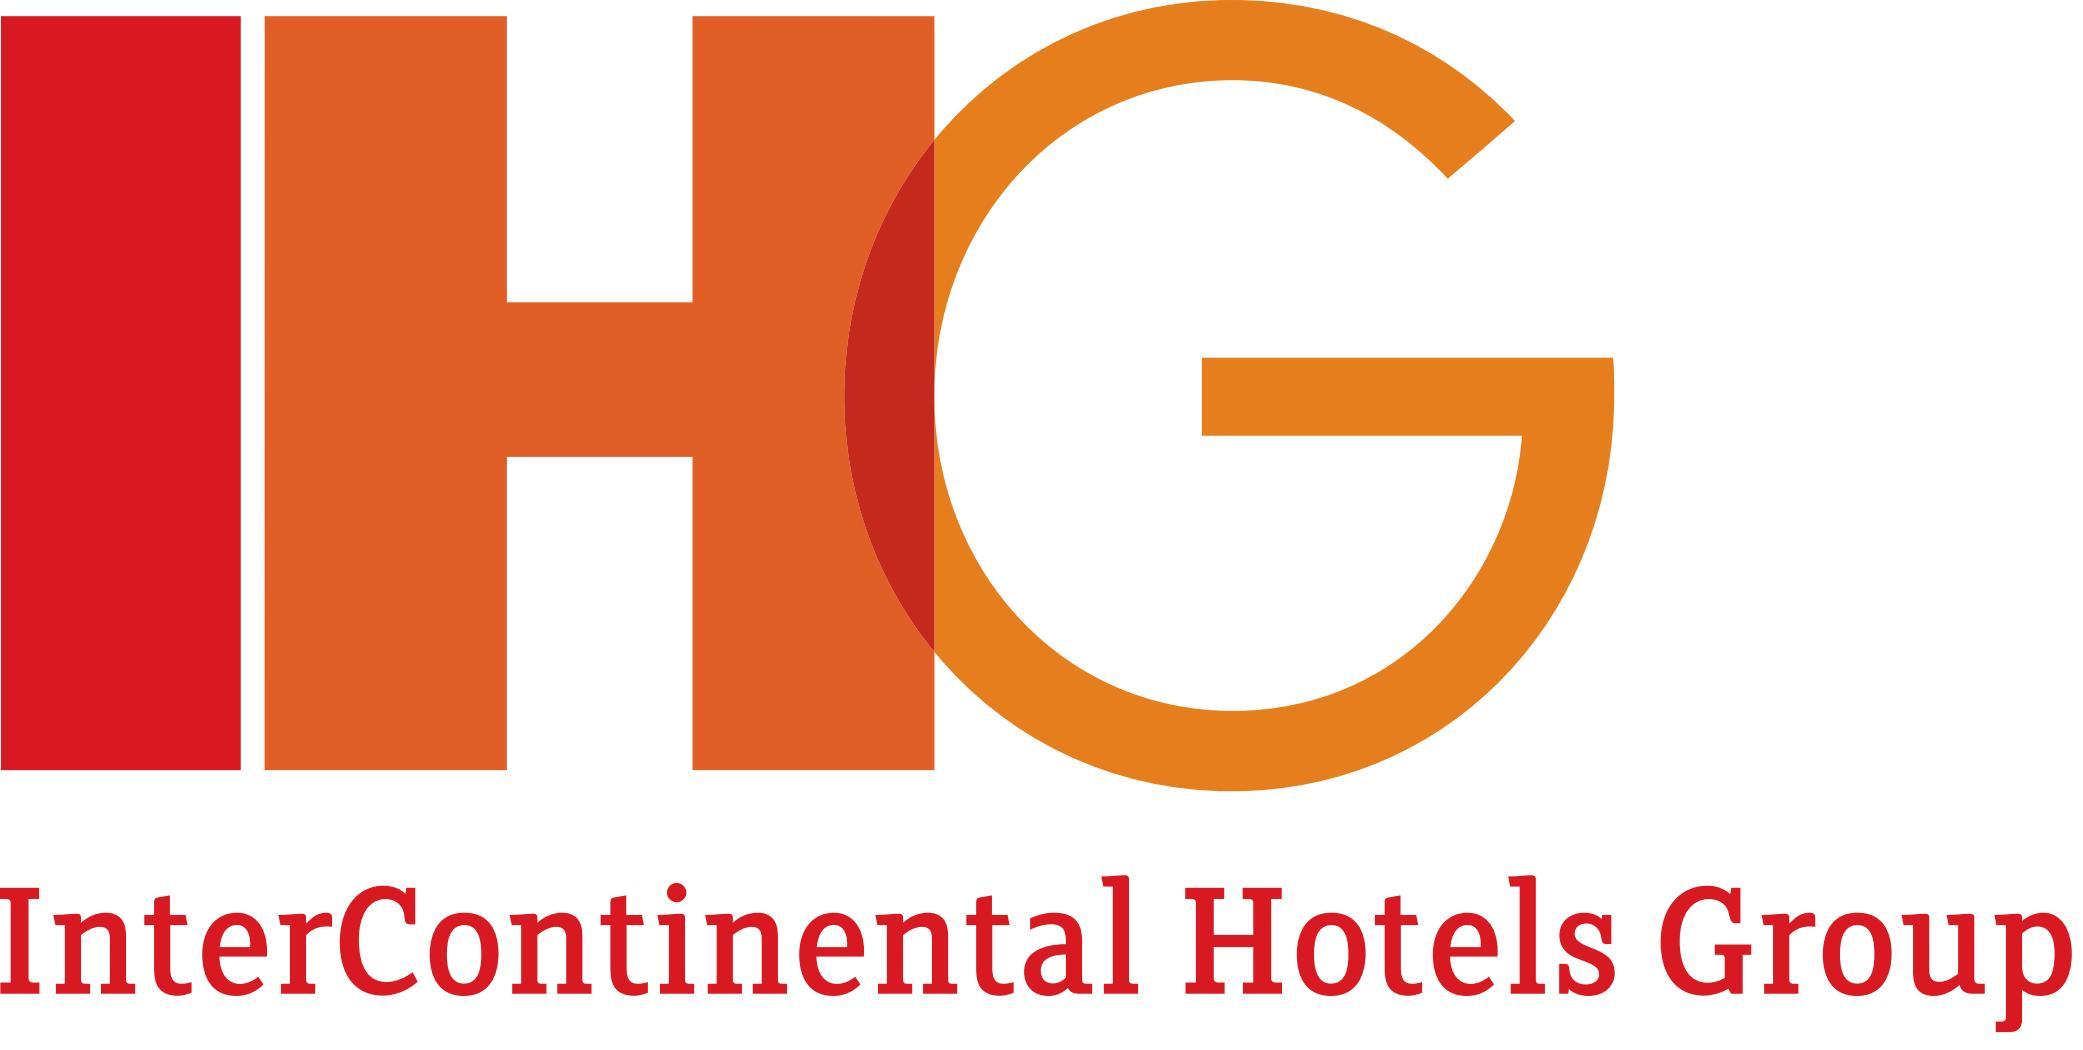 InterContinental_Hotels_Group-logo.jpg